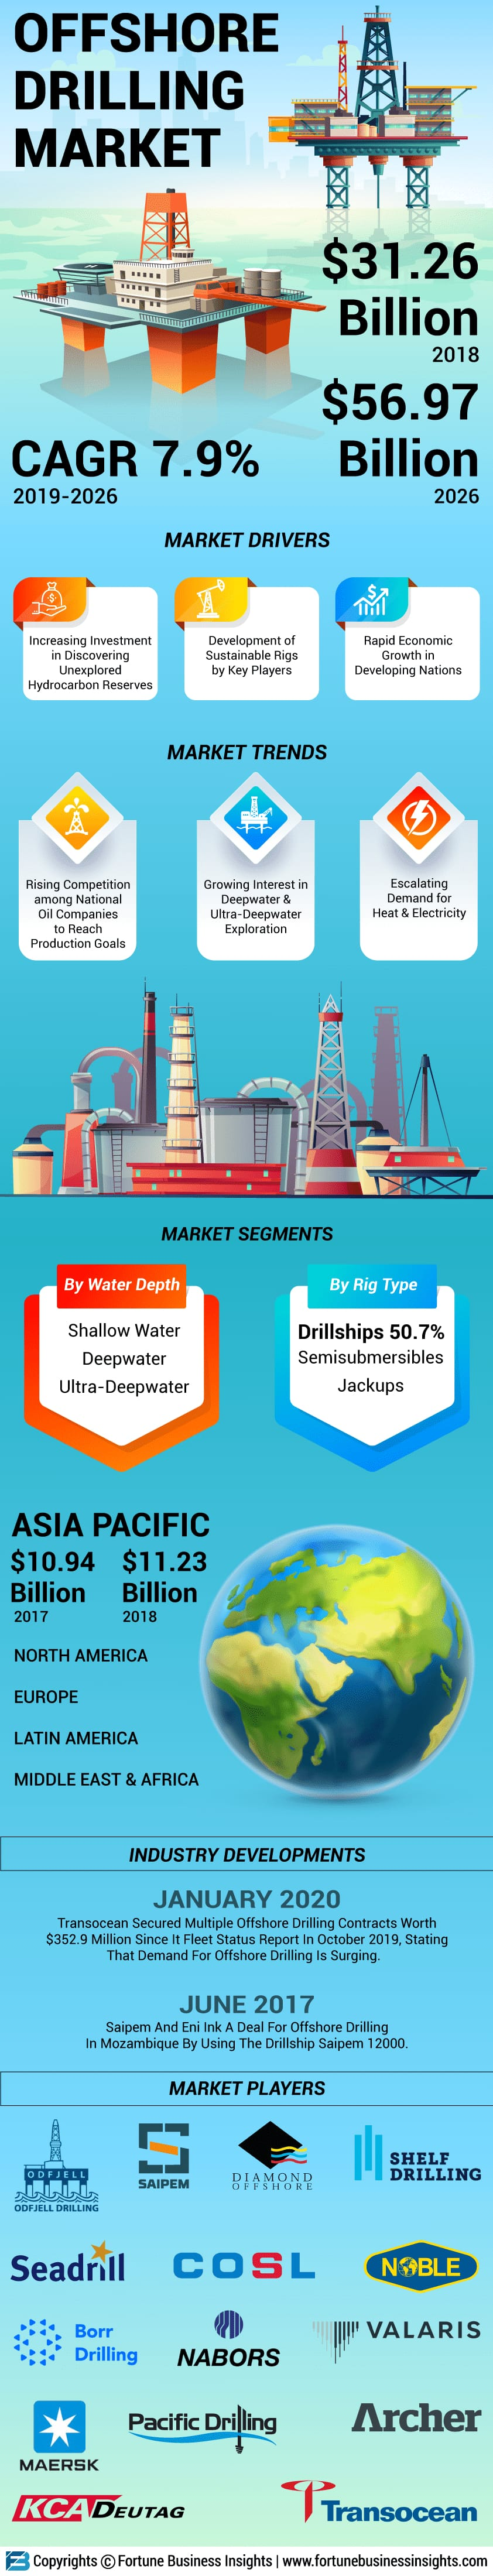 Offshore Drilling Market